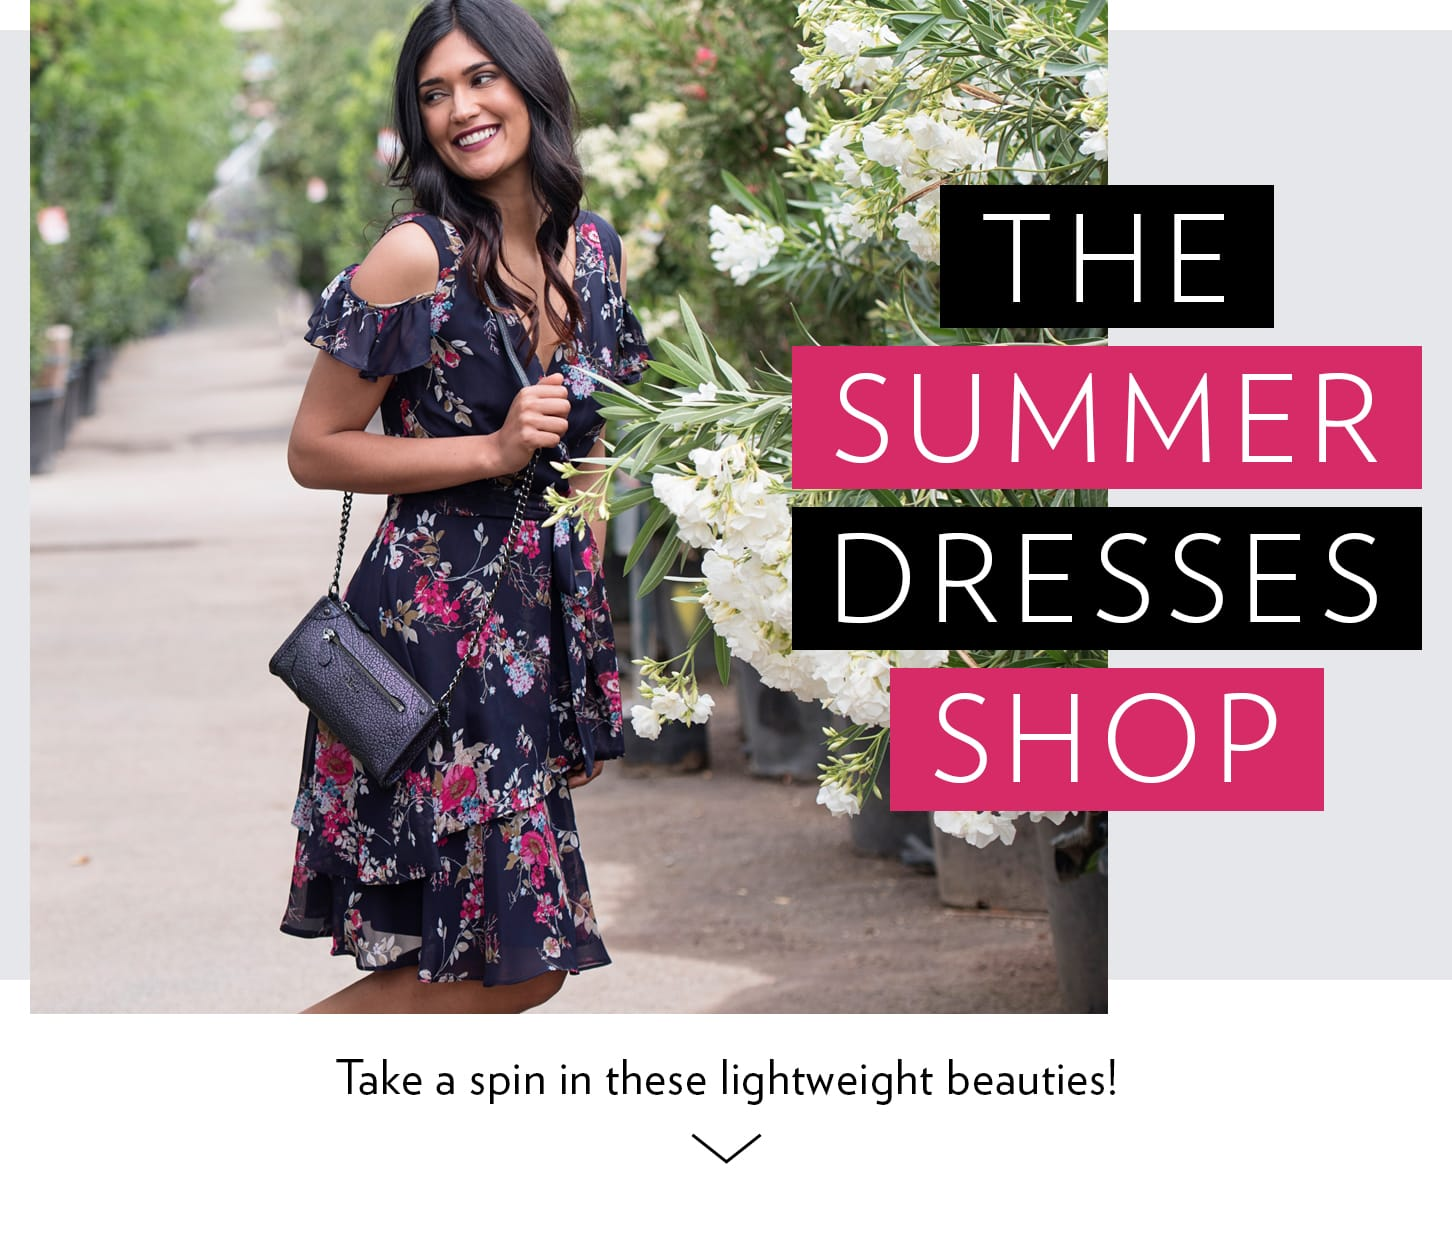 The Summer Dresses Shop